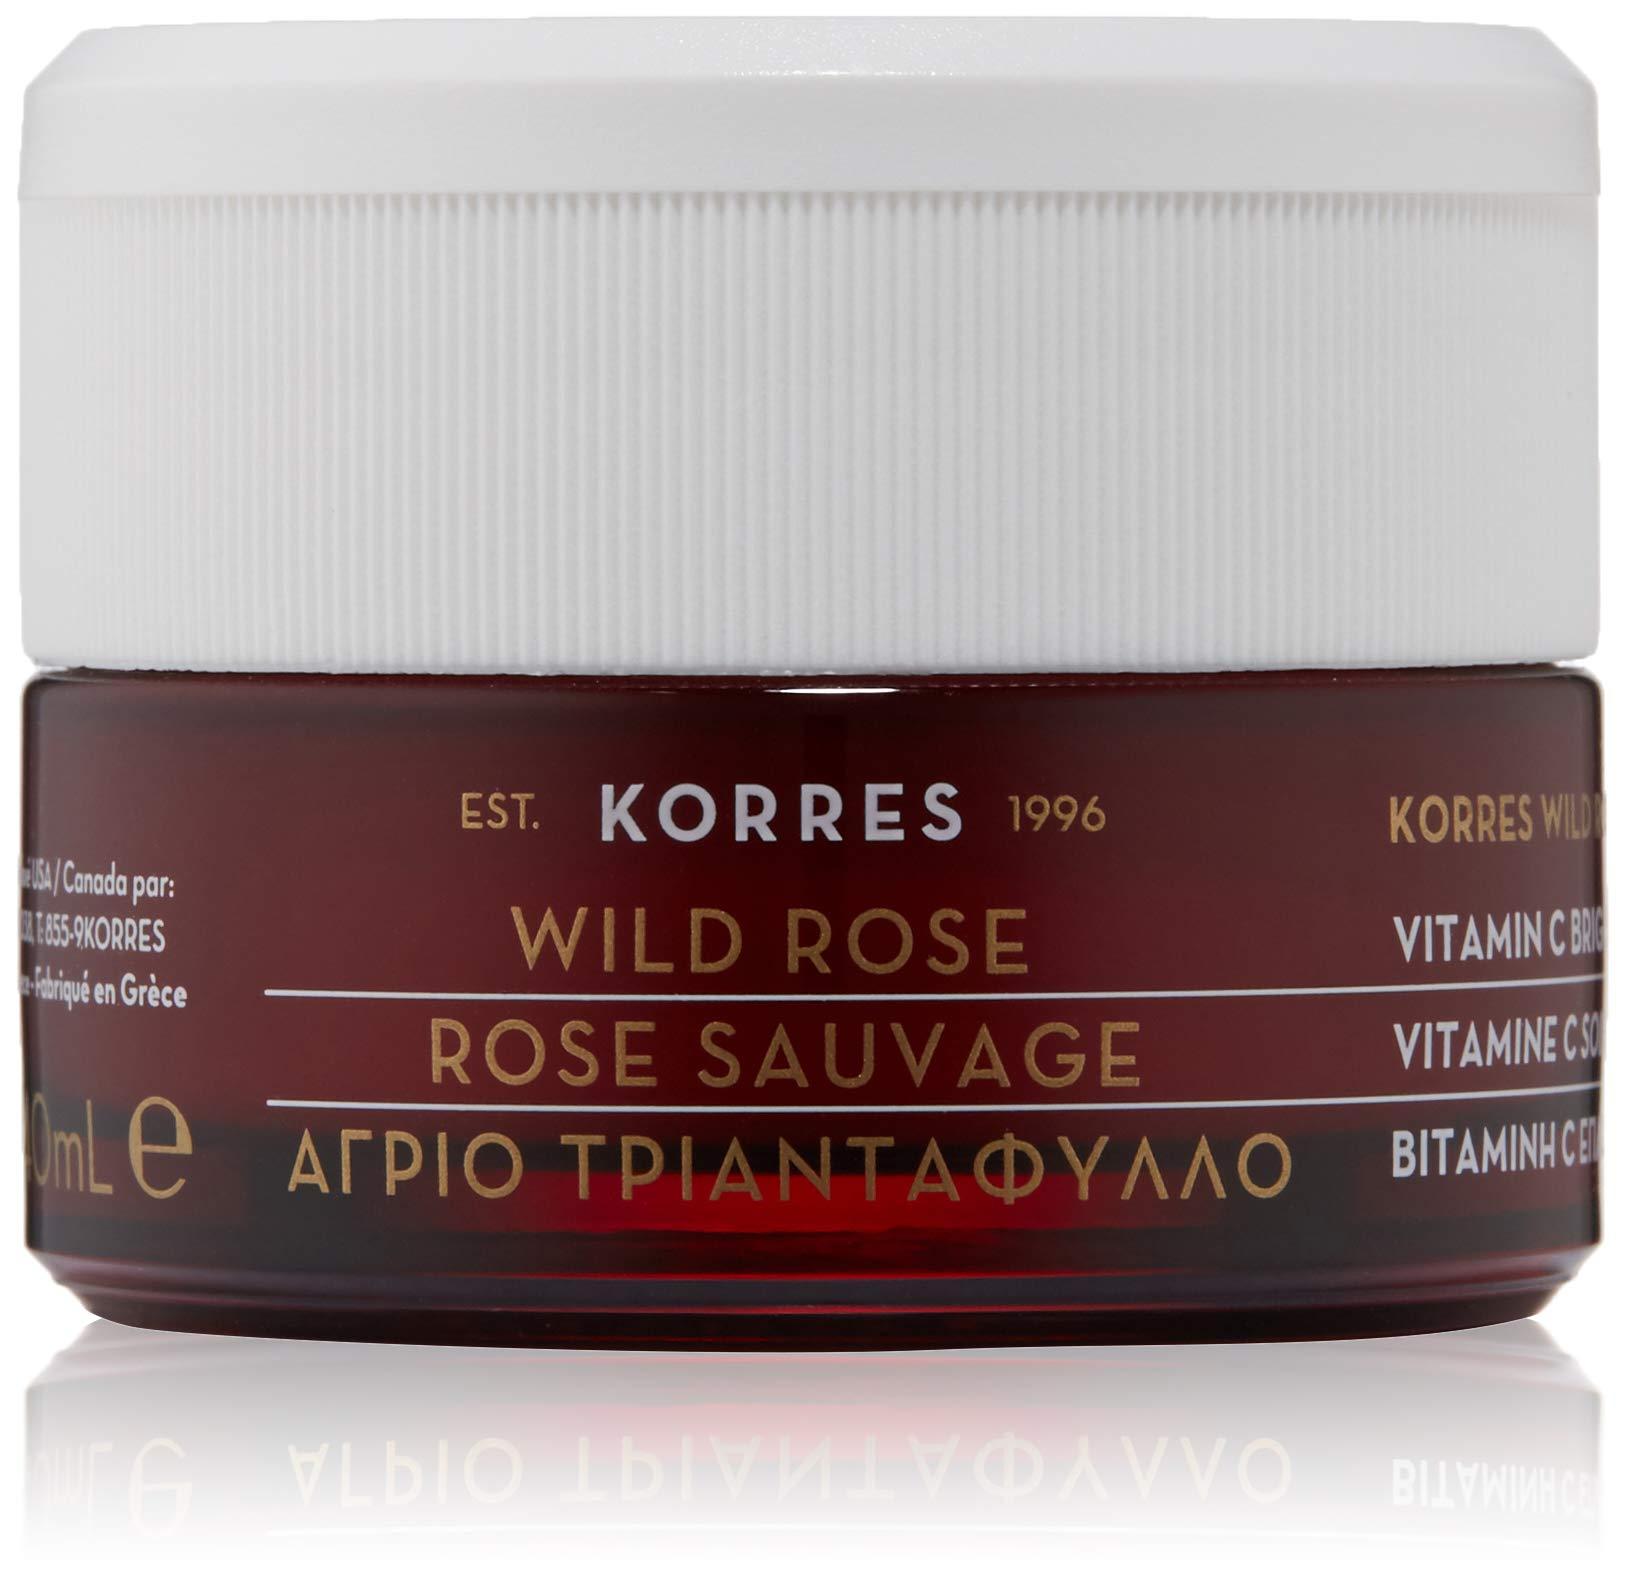 KORRES Wild Rose Vitamin C Brightening Sleeping Facial, 1.35 Fl. Oz